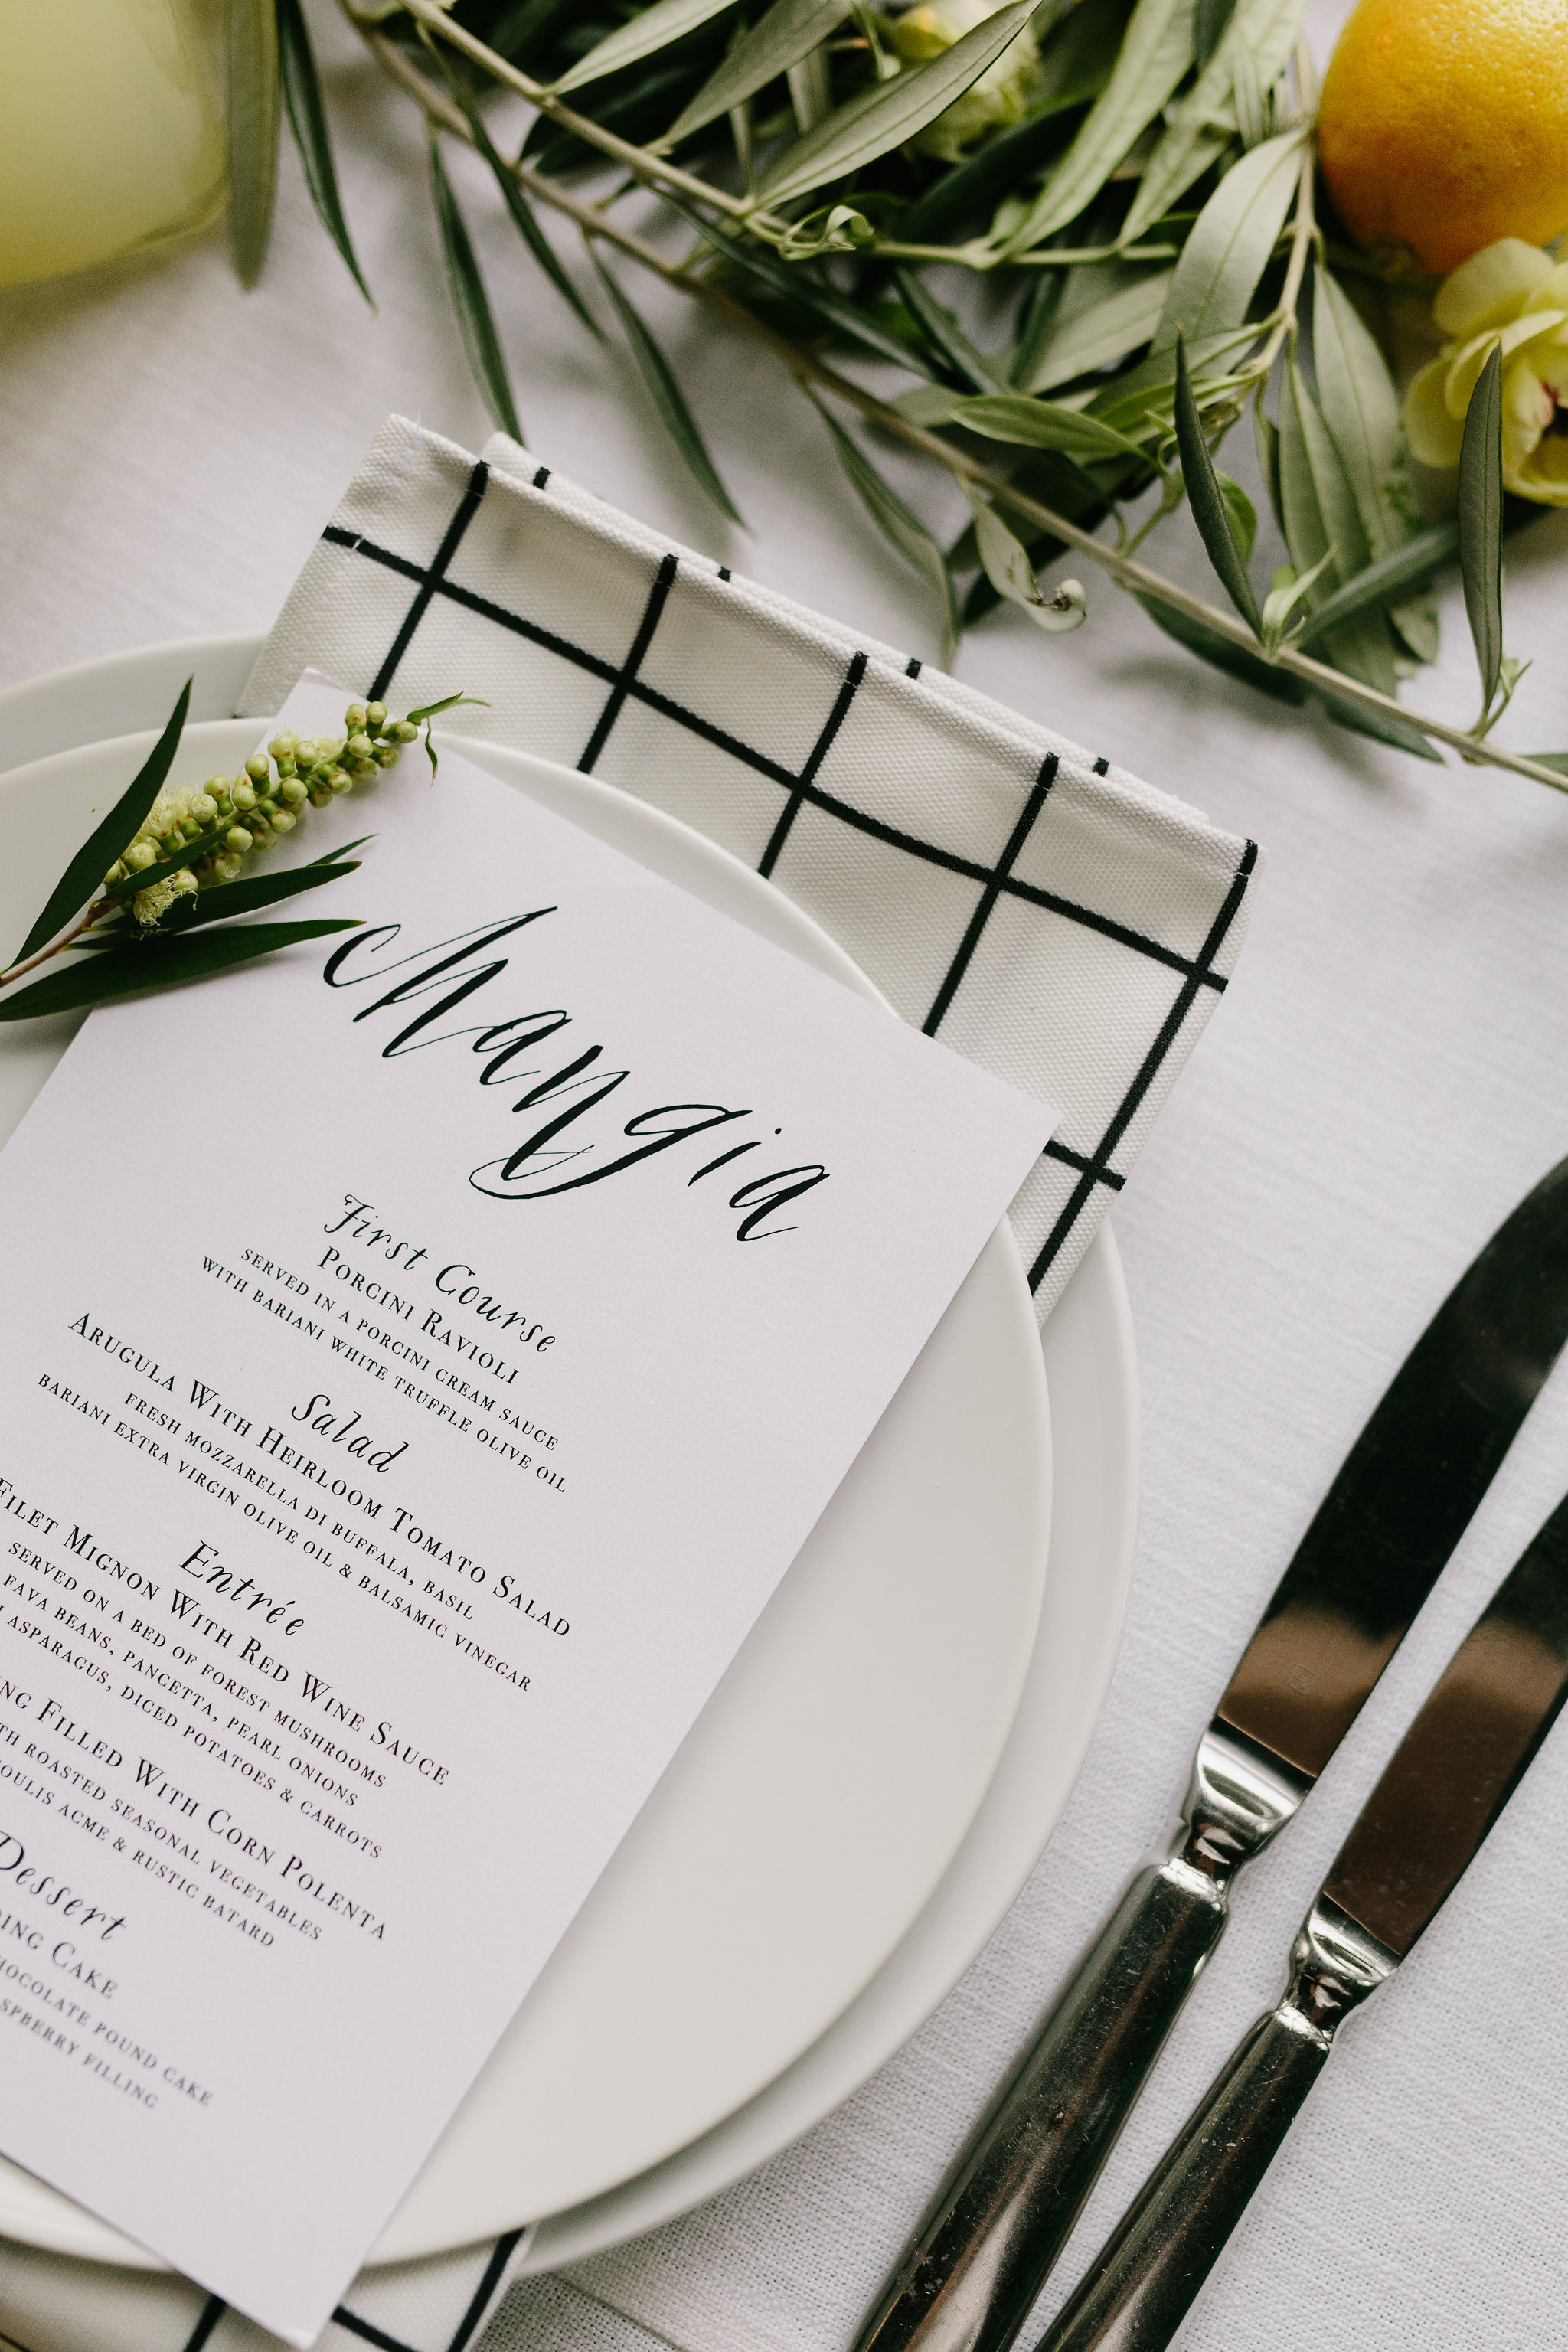 Italia themed wedding